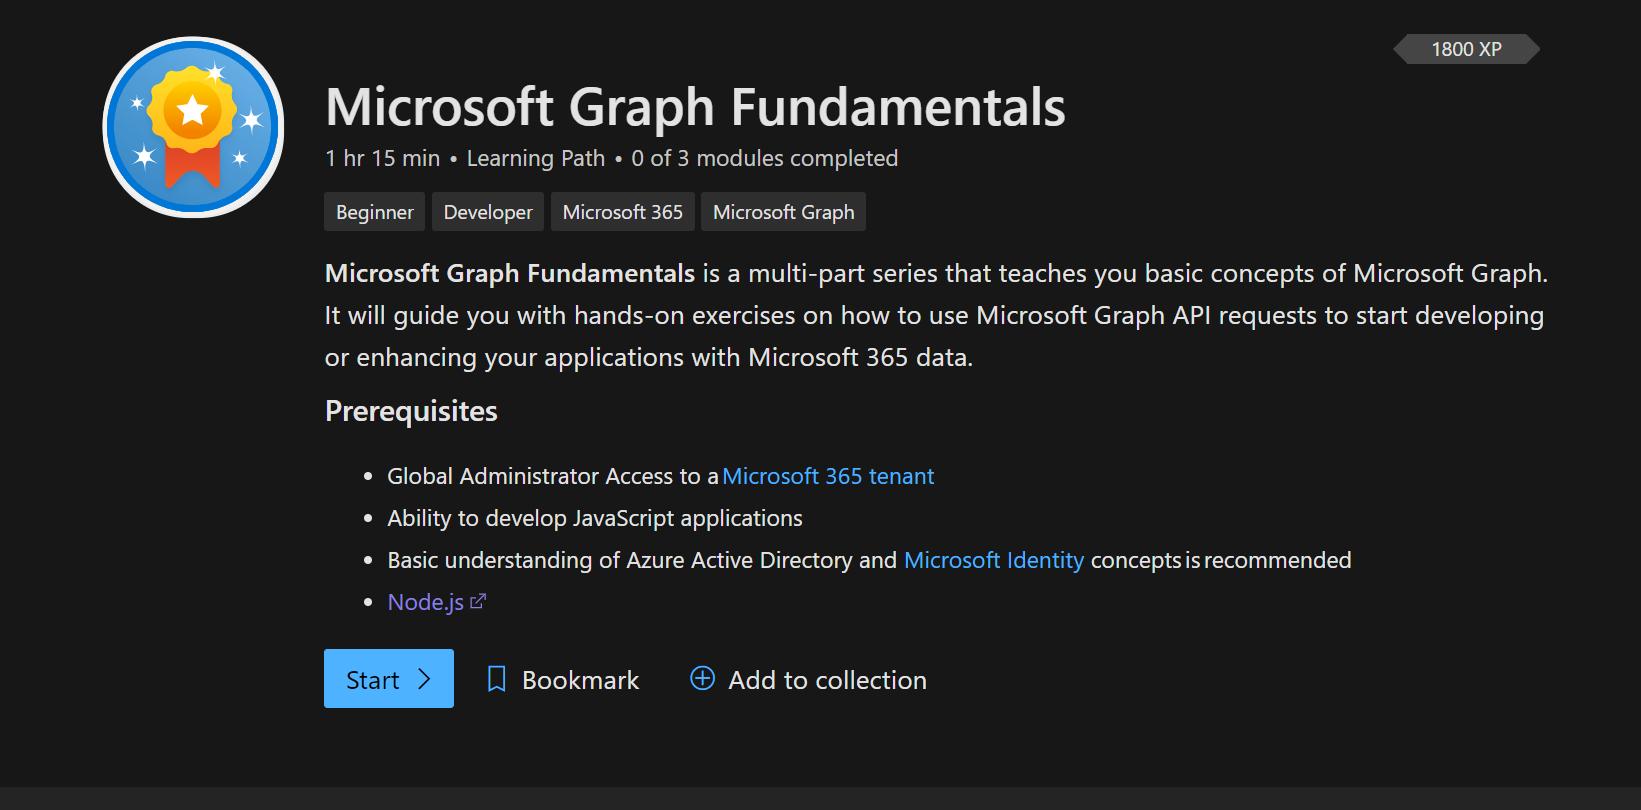 Microsoft Graph Fundamentals LearningPath